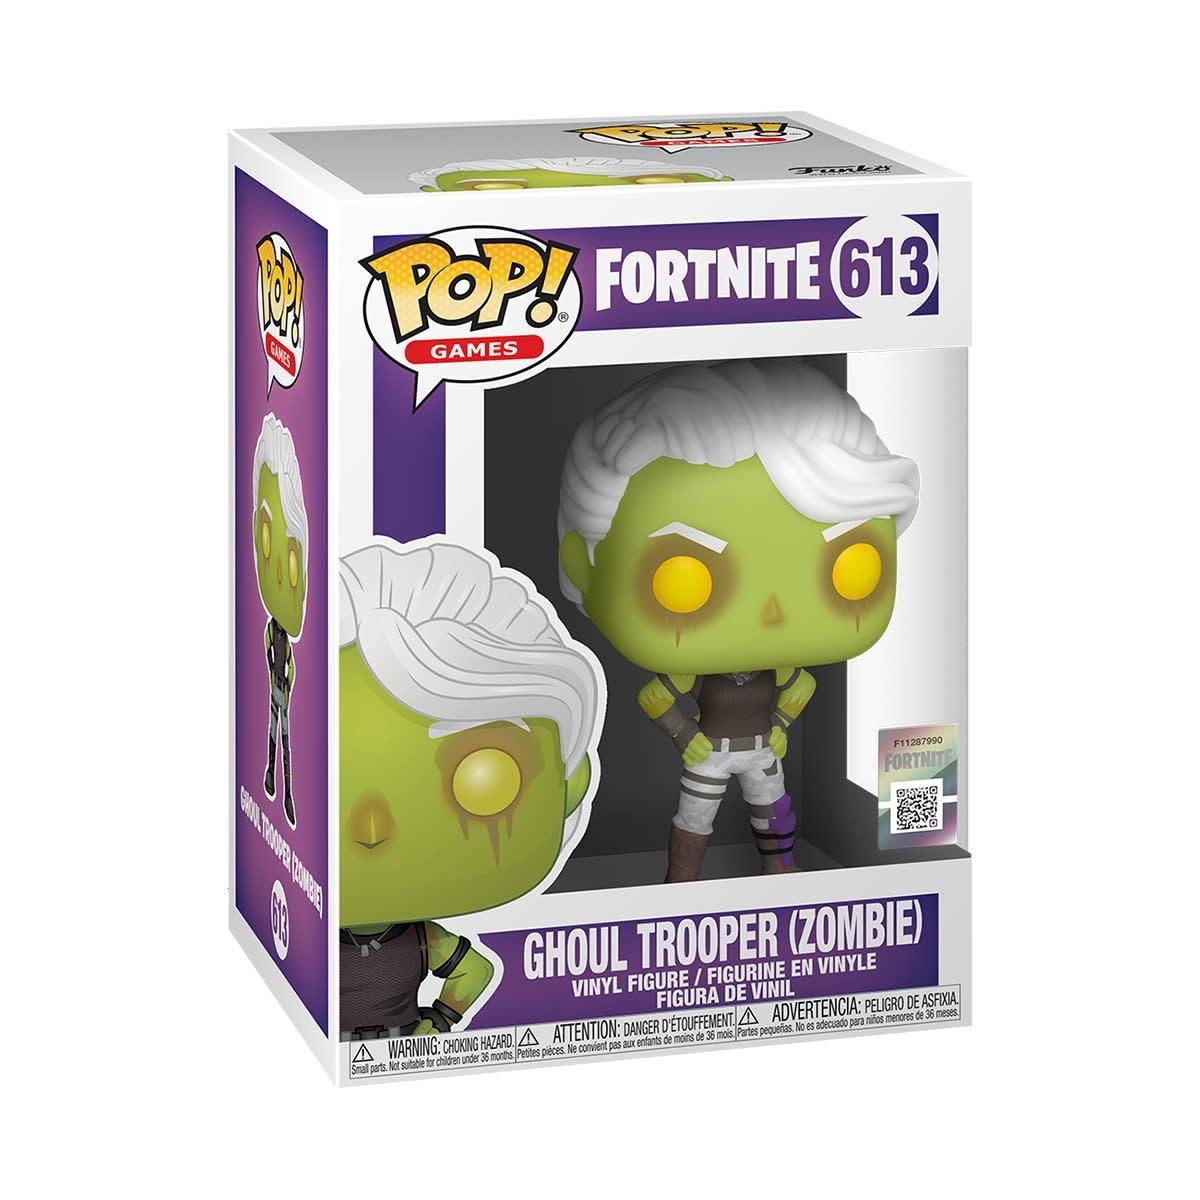 Pop! Fortnite: Ghoul Trooper